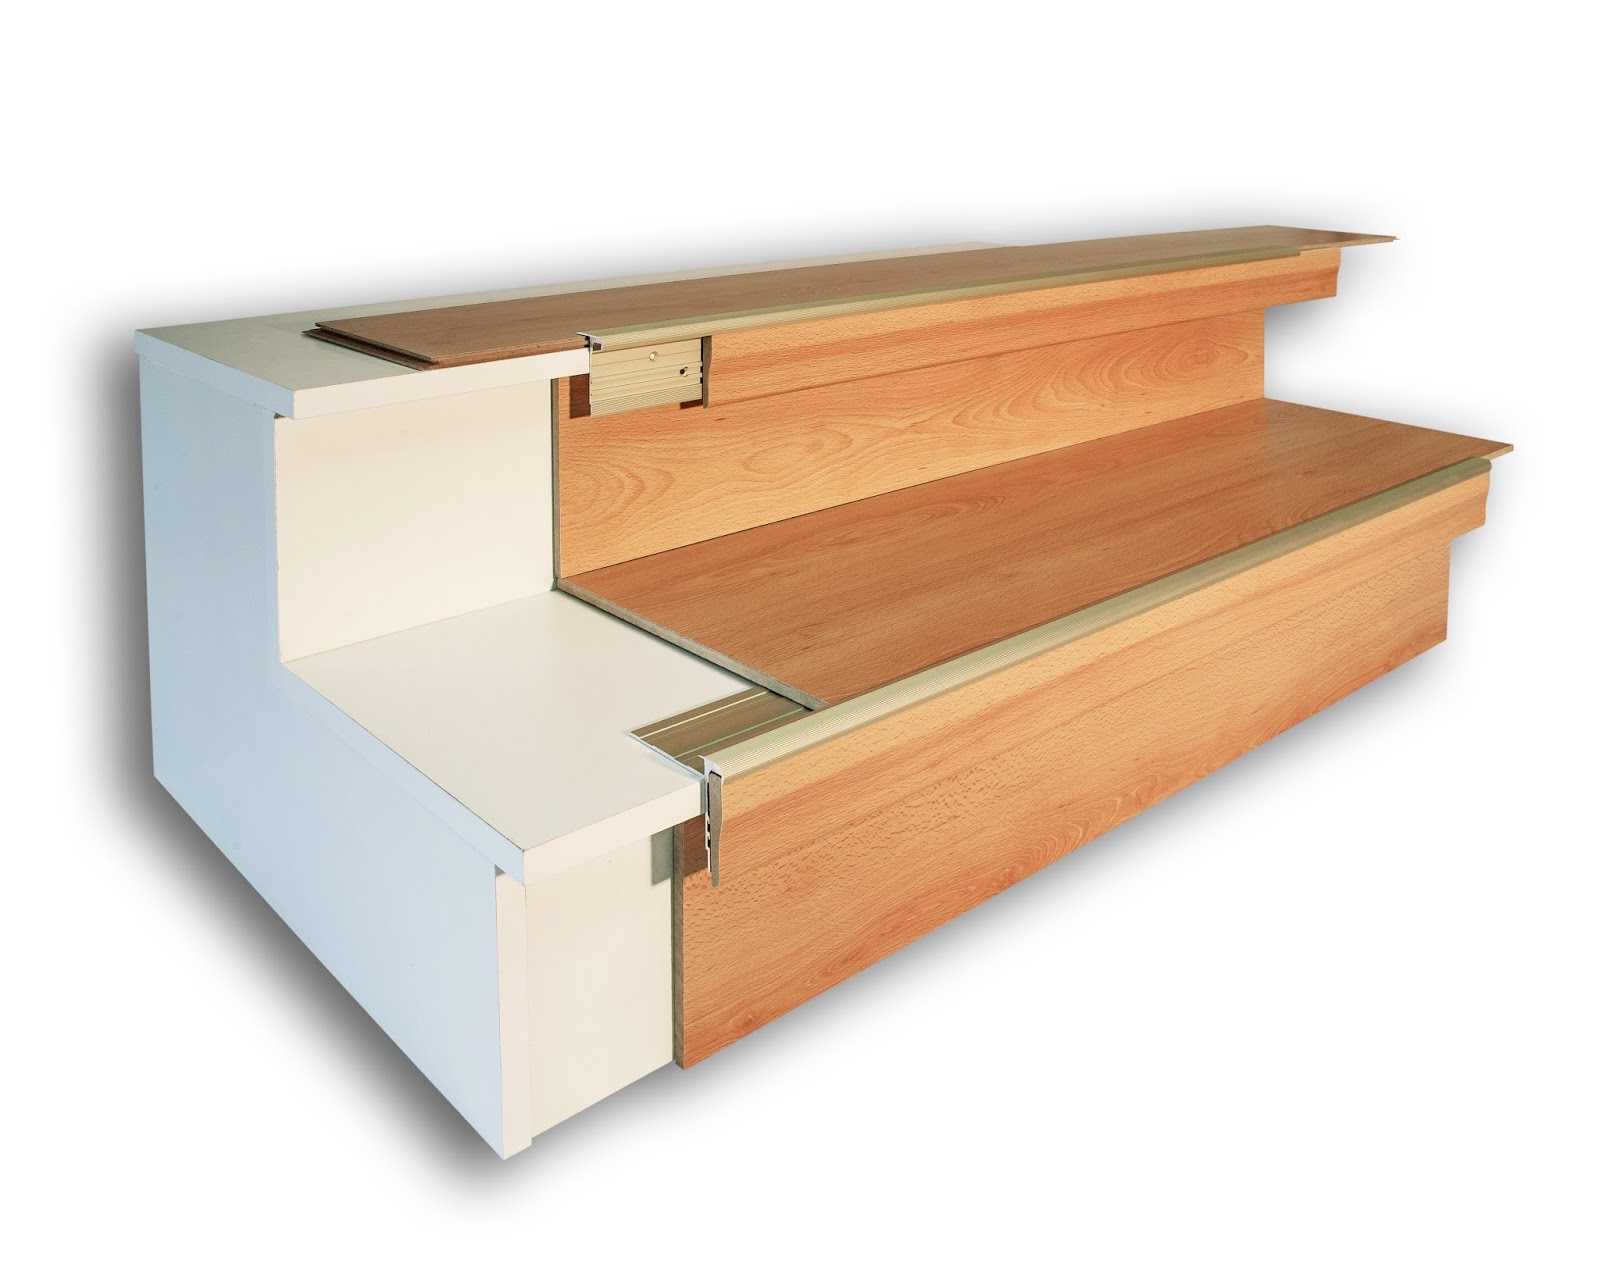 vinyl platten verlegen ot02 hitoiro. Black Bedroom Furniture Sets. Home Design Ideas